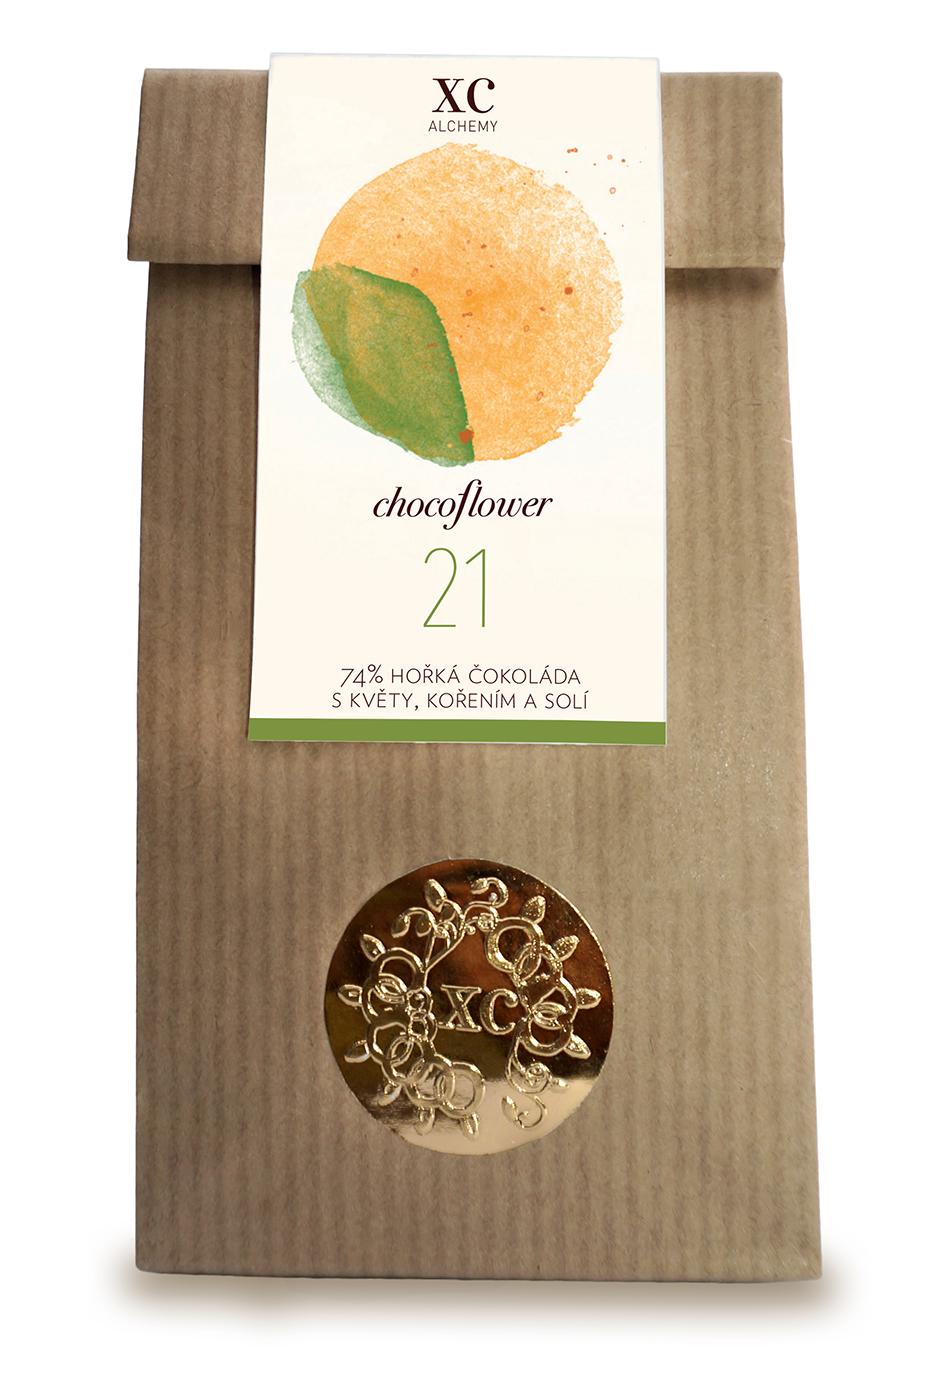 xc chocoflower 21 pure L